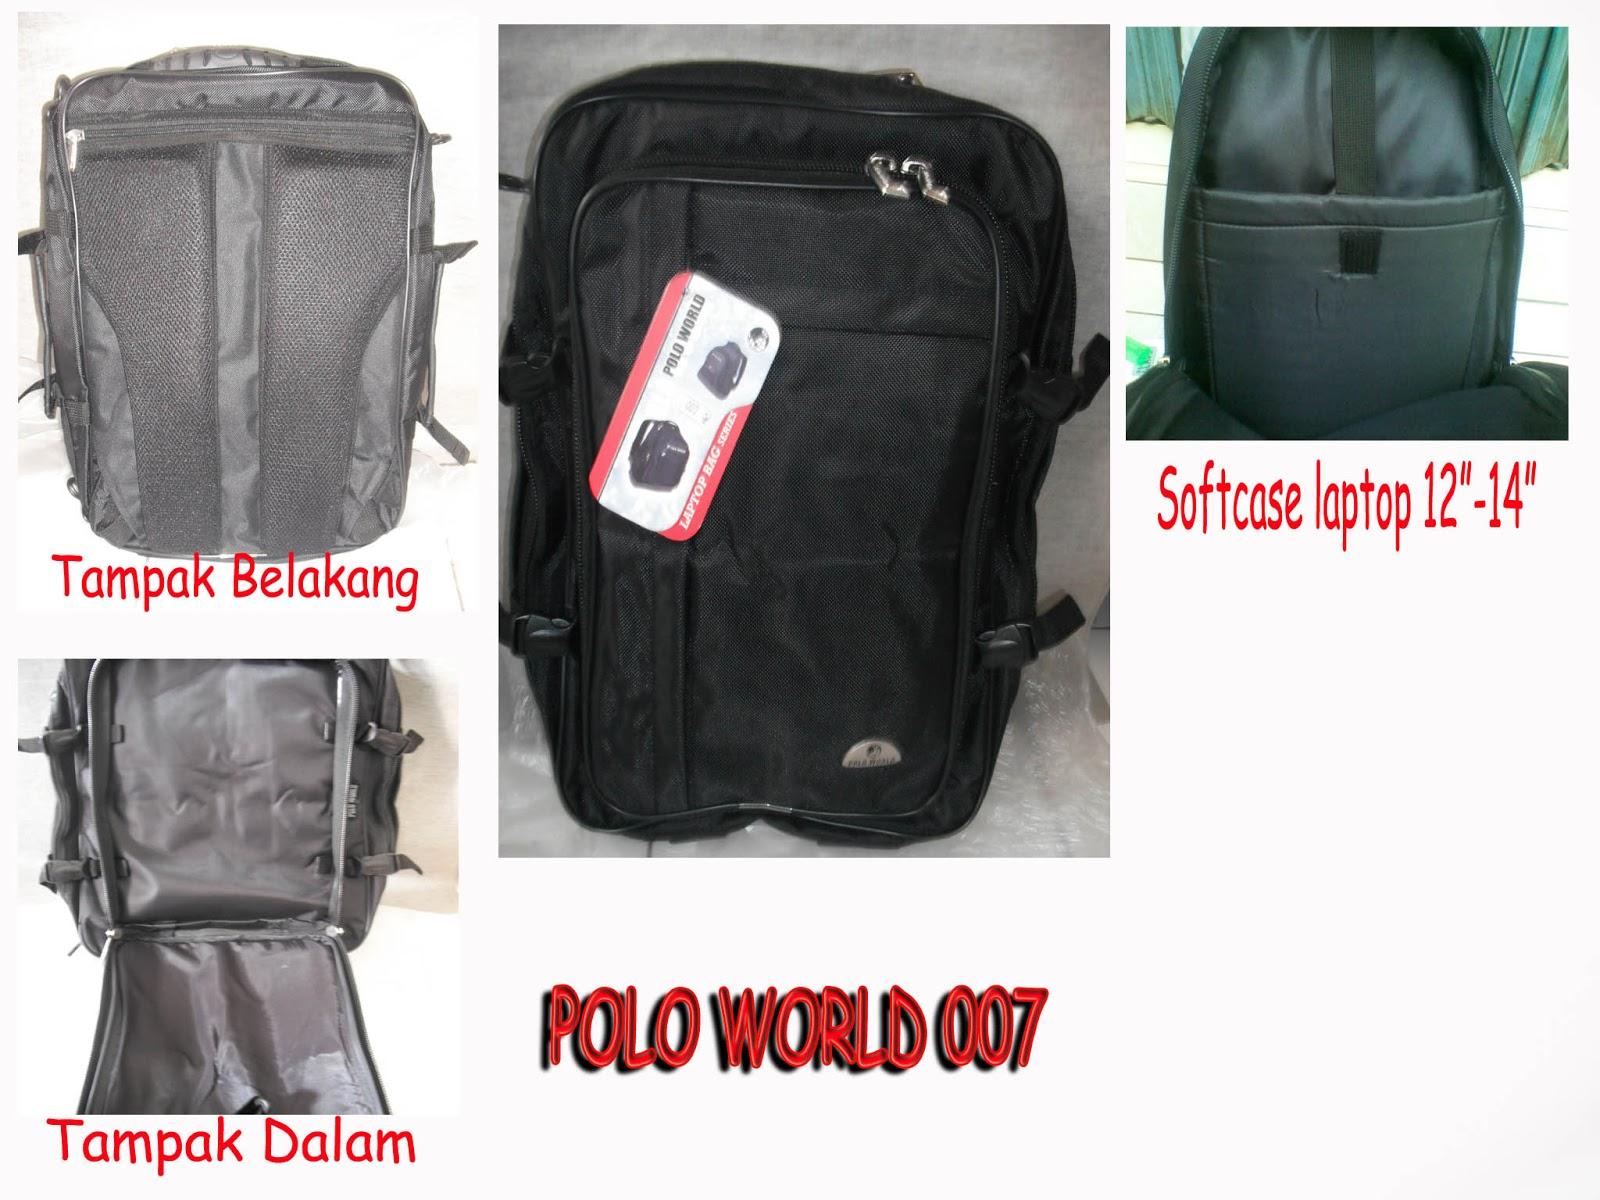 Distributor Tas Rangsel  Tas Ransel Laptop Polo World 007 55de497fb9acc